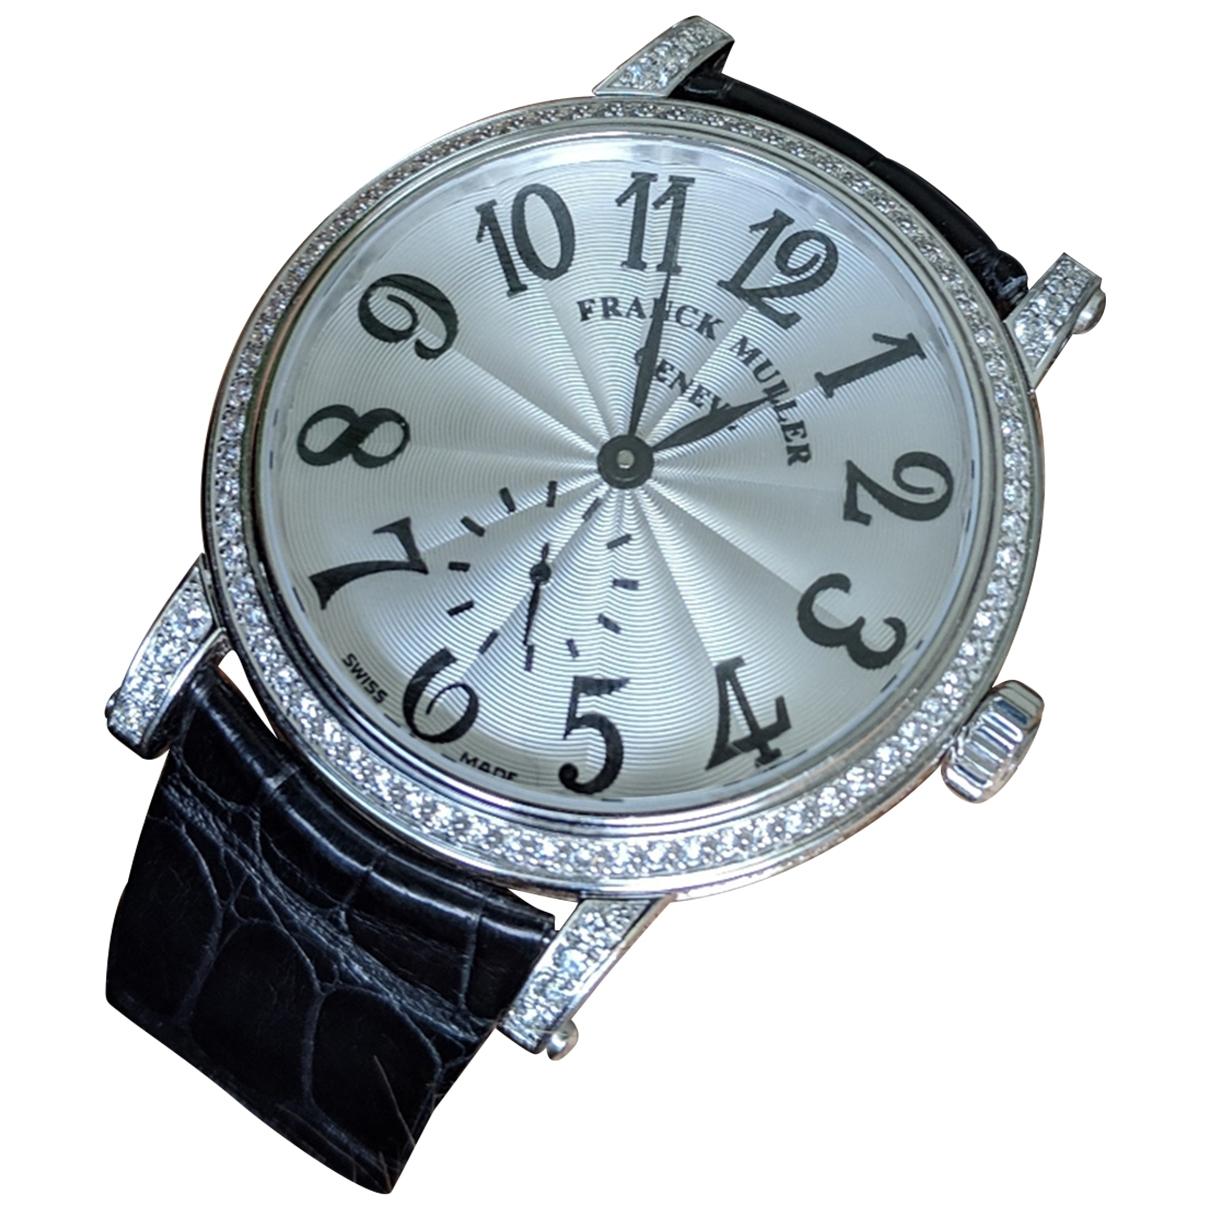 Relojes de Oro blanco Franck Muller